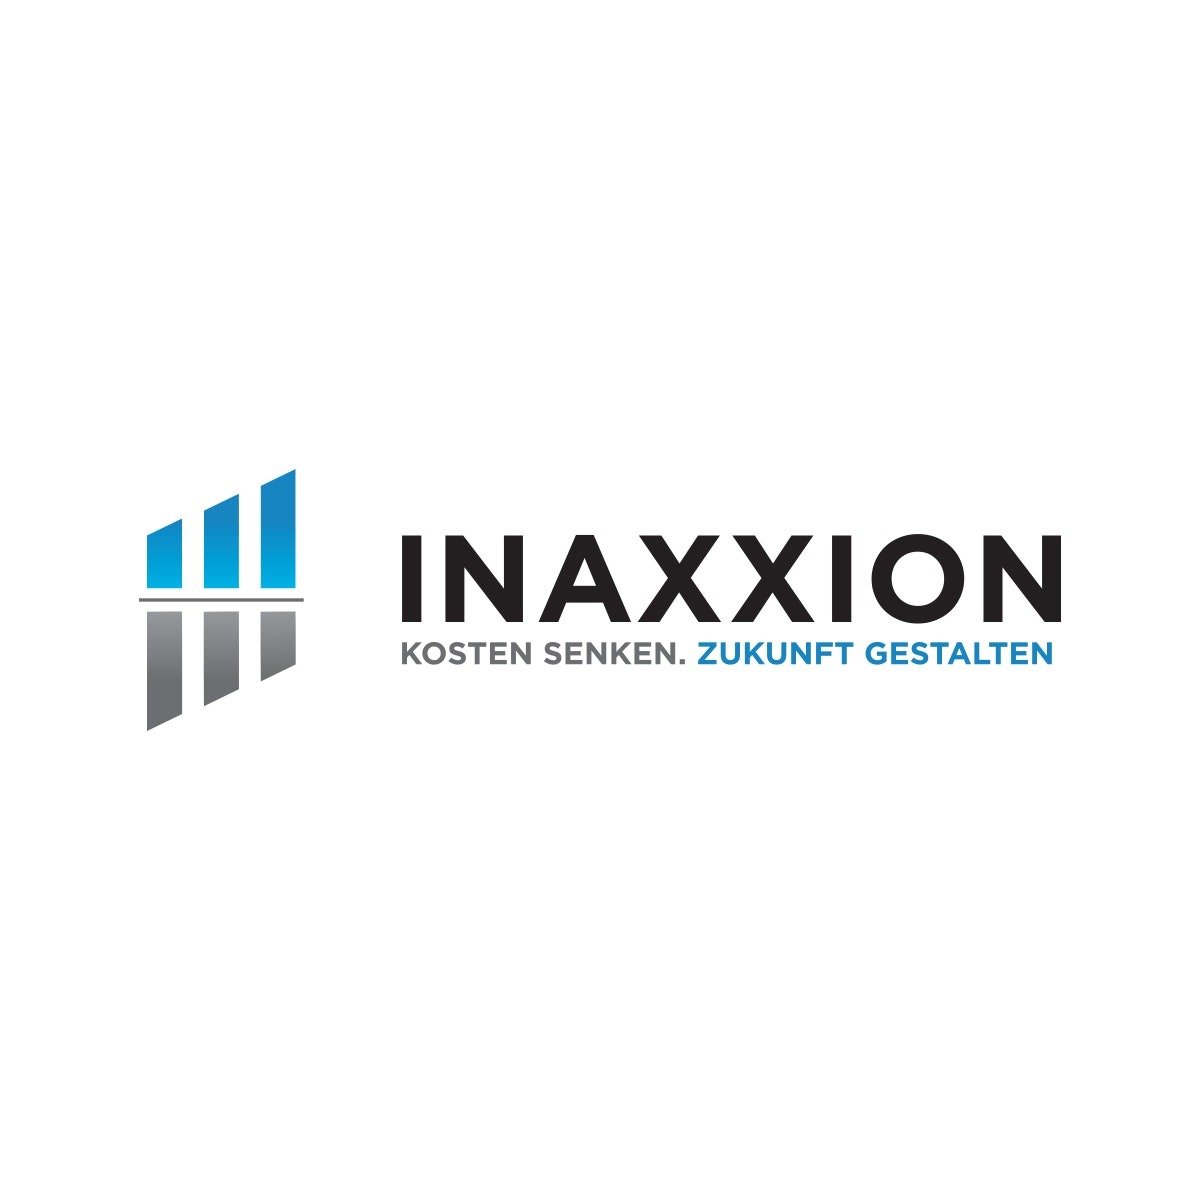 INAXXION GmbH